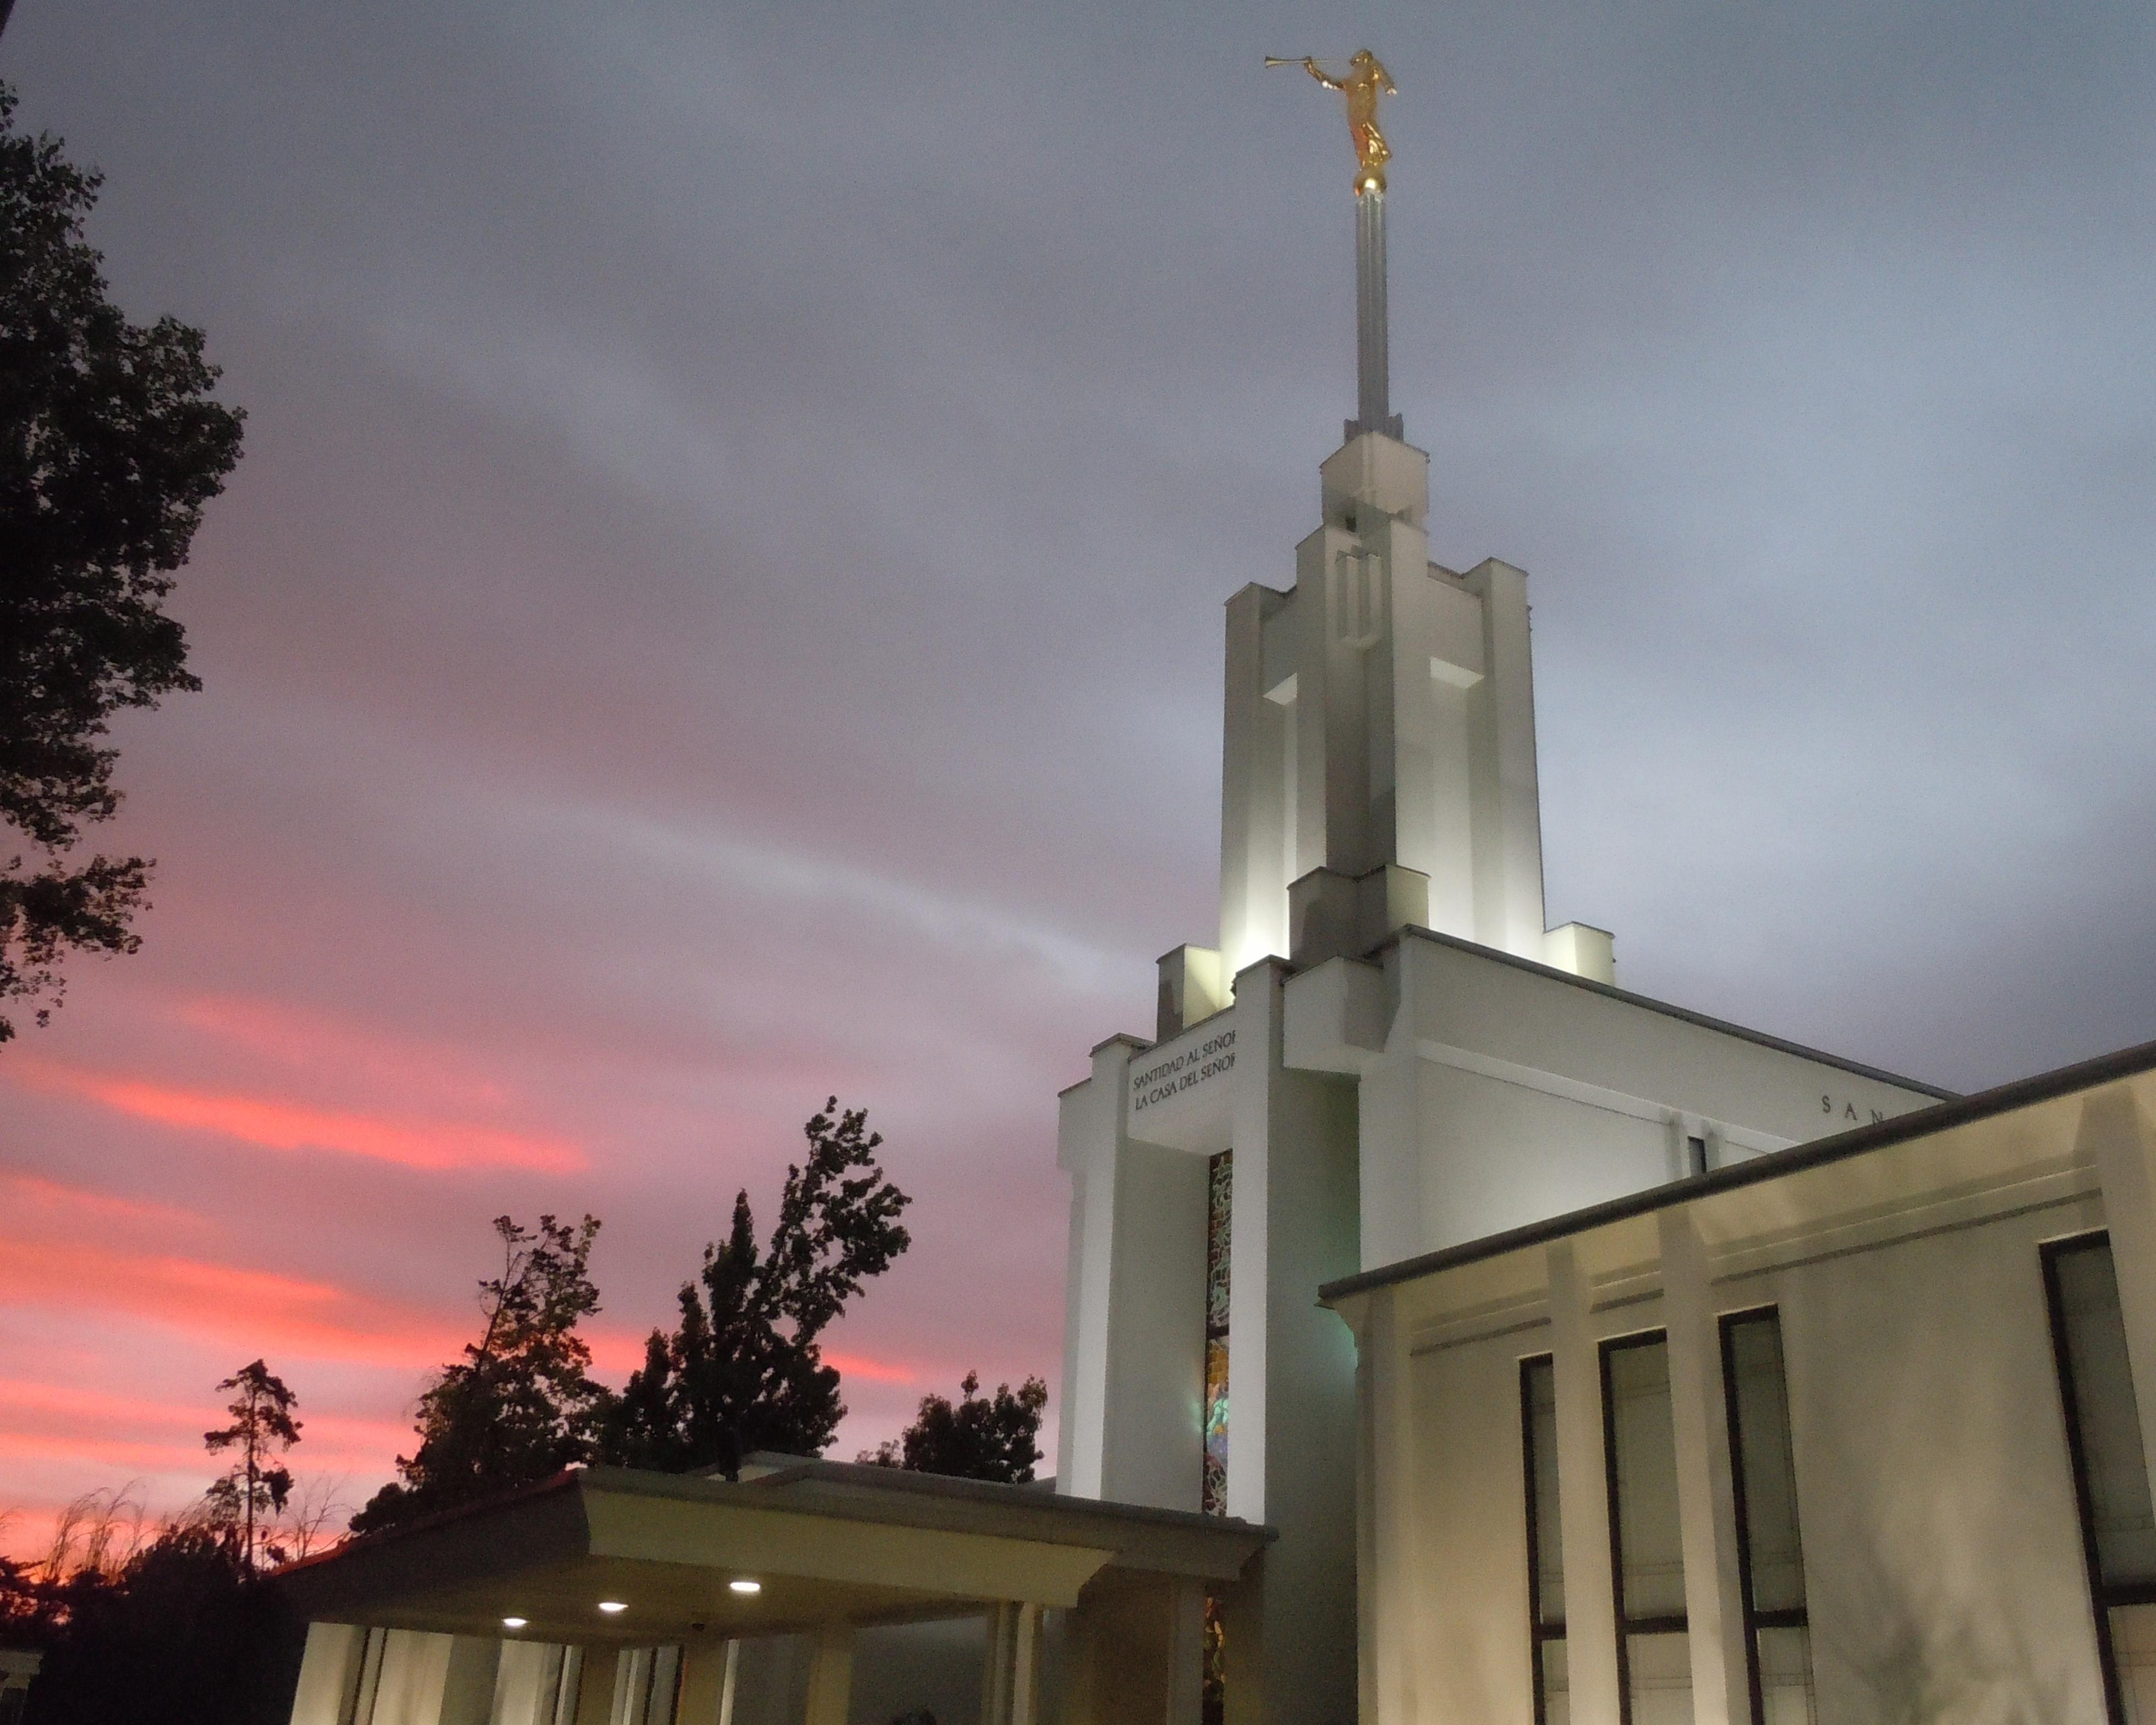 The Church of Jesus Christ of Latter-day Saints | 705 S 38th Ave, Yakima, WA, 98902 | +1 (509) 965-0584